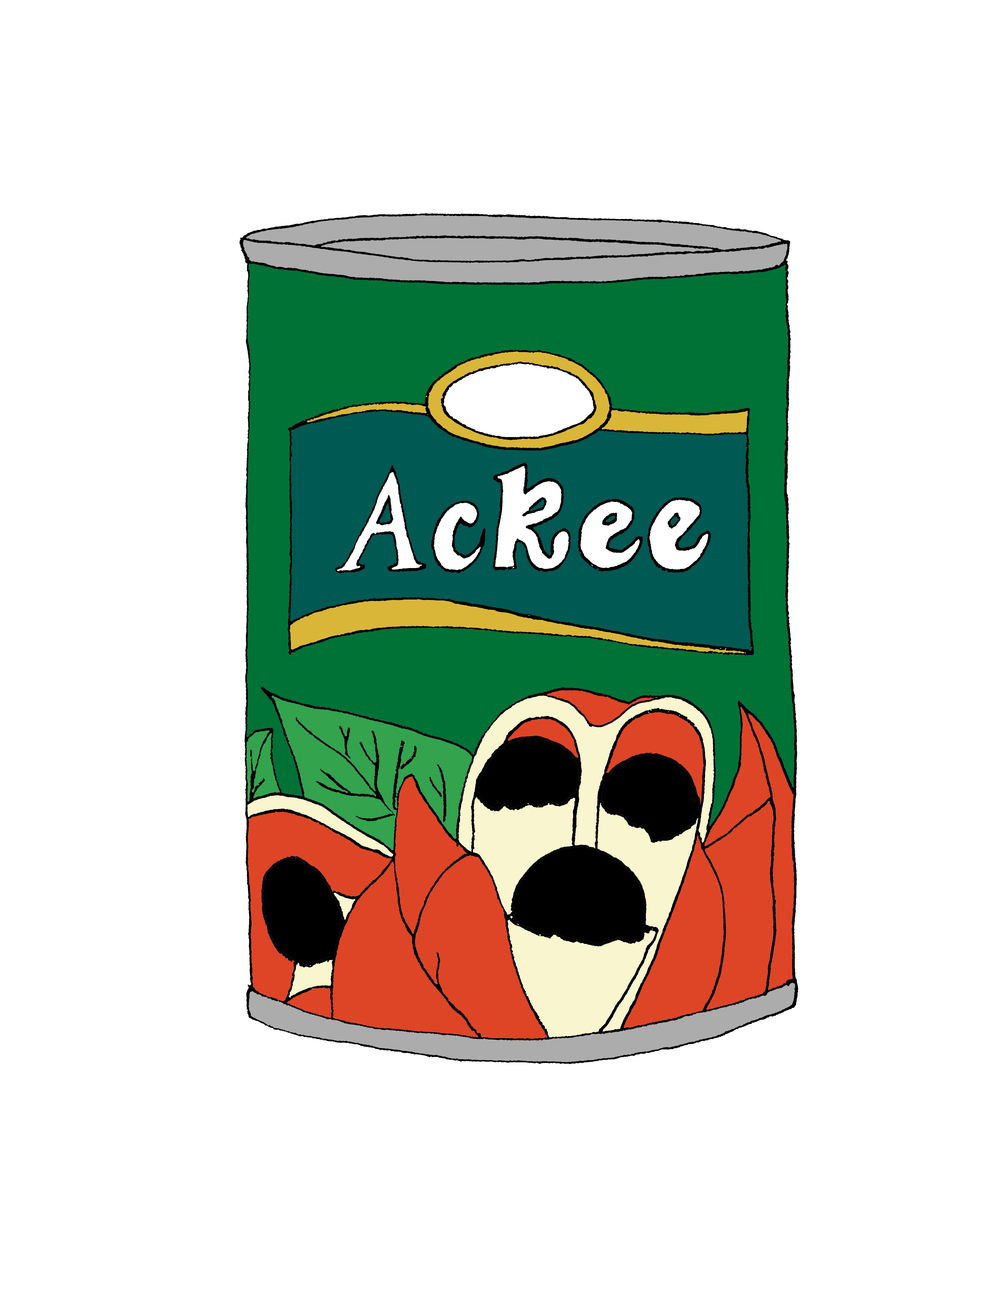 ackee.jpg